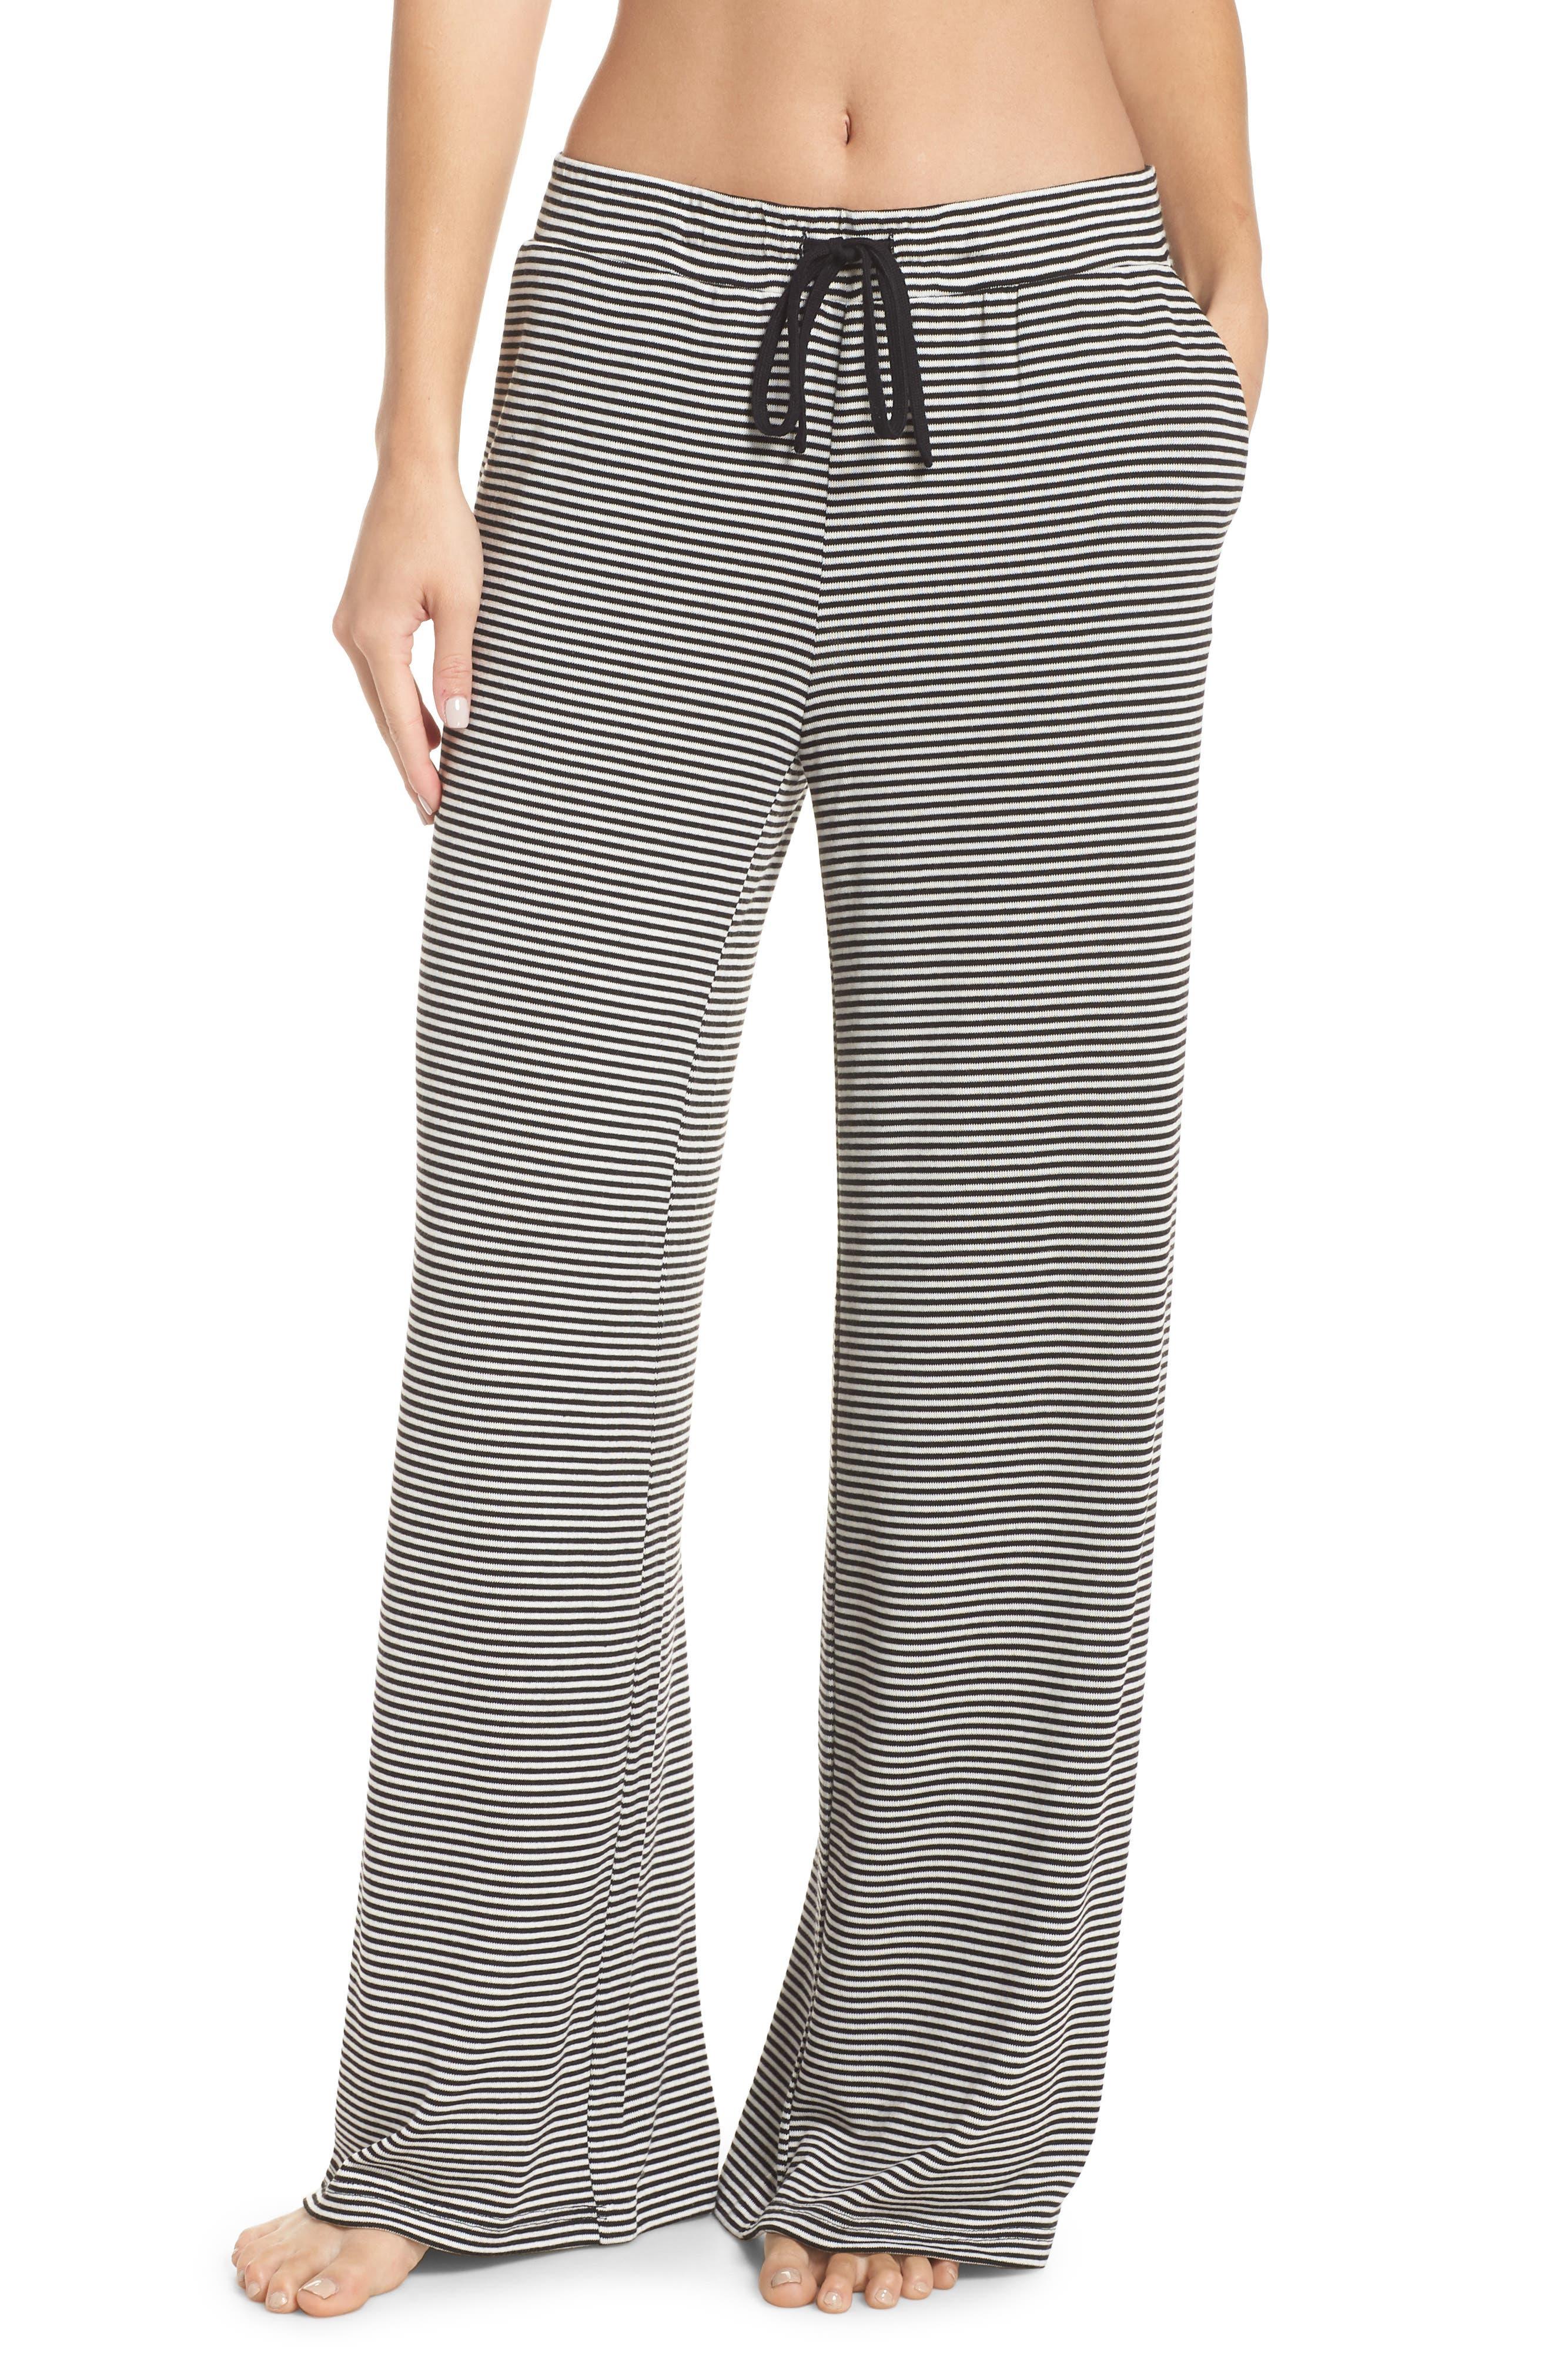 Dreams Wide Leg Pajama Pants,                             Main thumbnail 1, color,                             BLACK